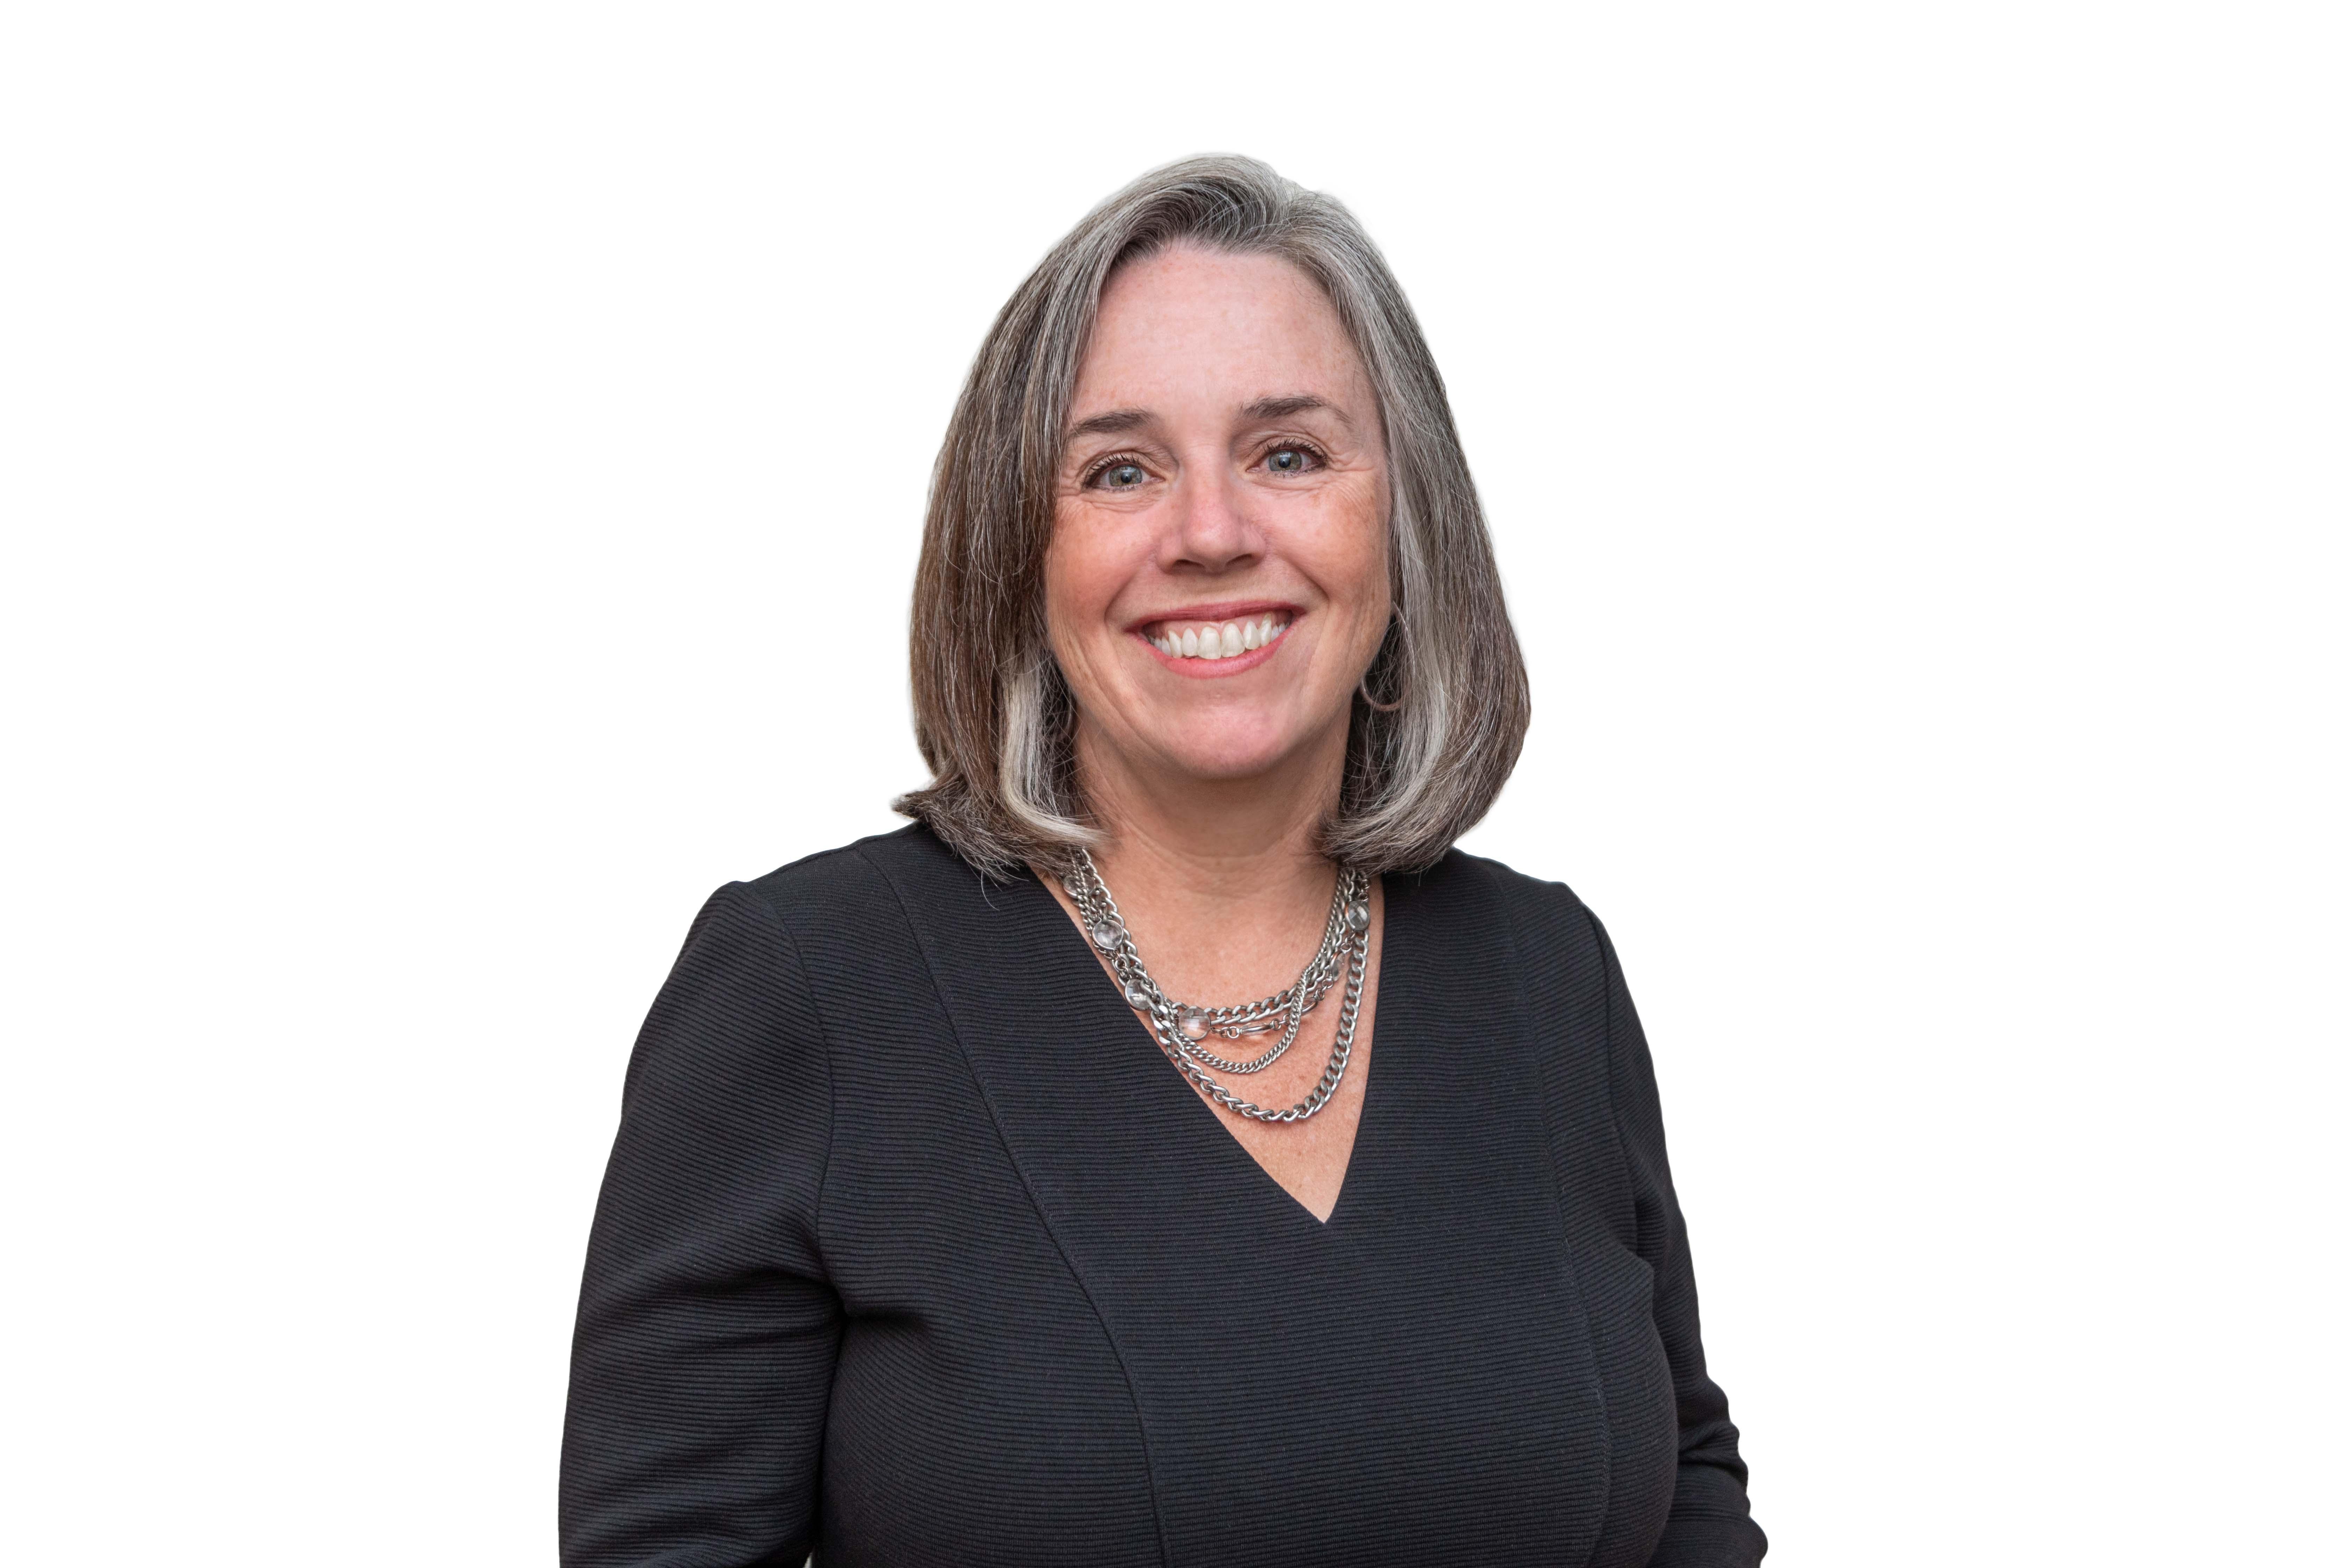 Kristin D. Lally